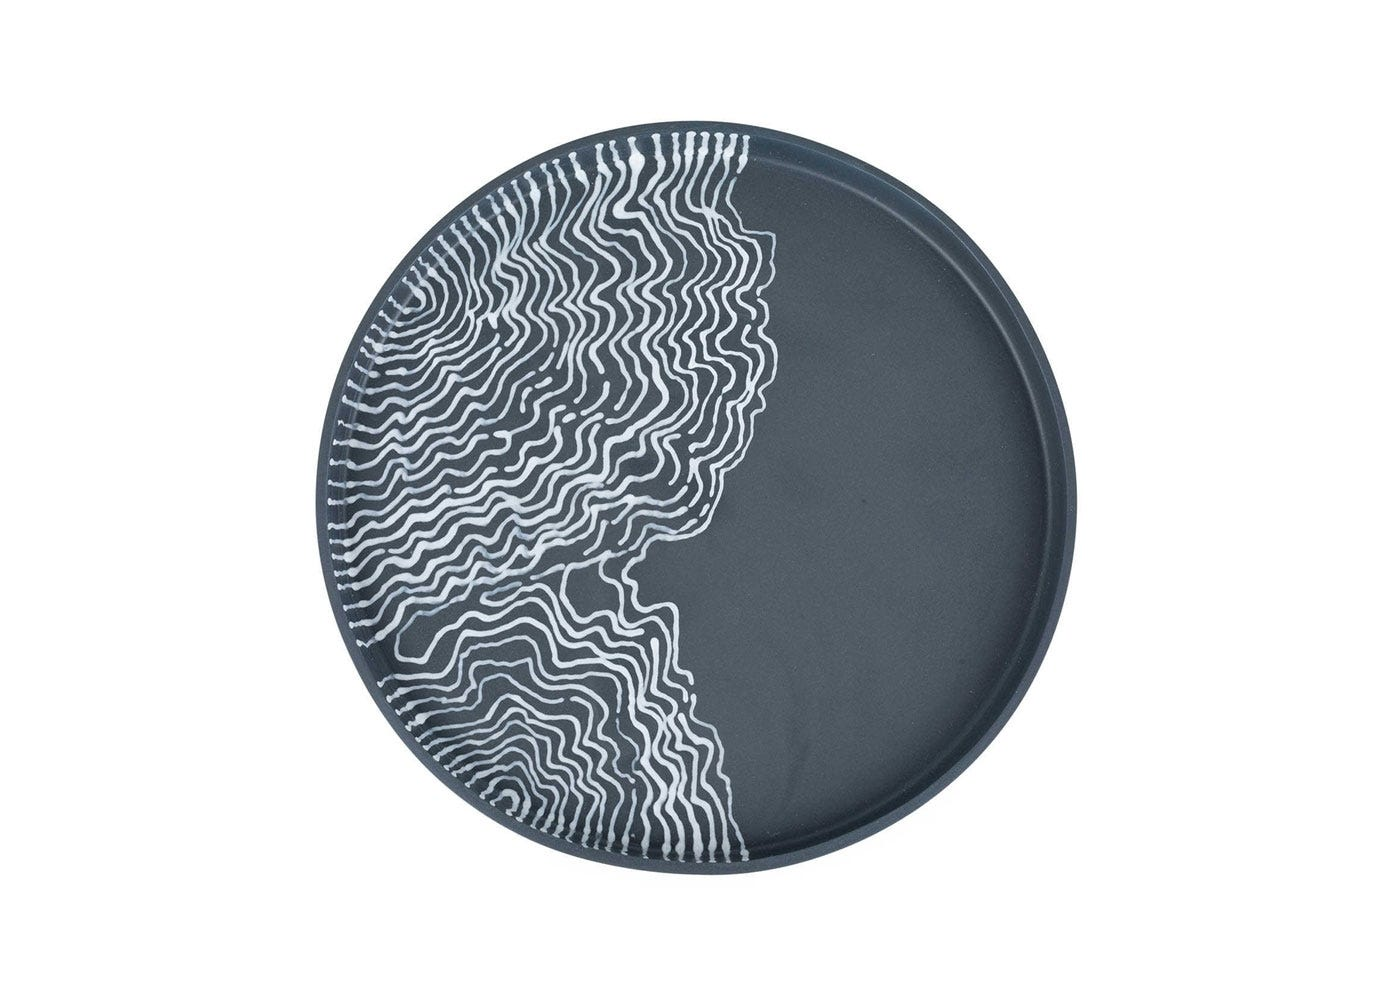 Estuarine plate black small front view